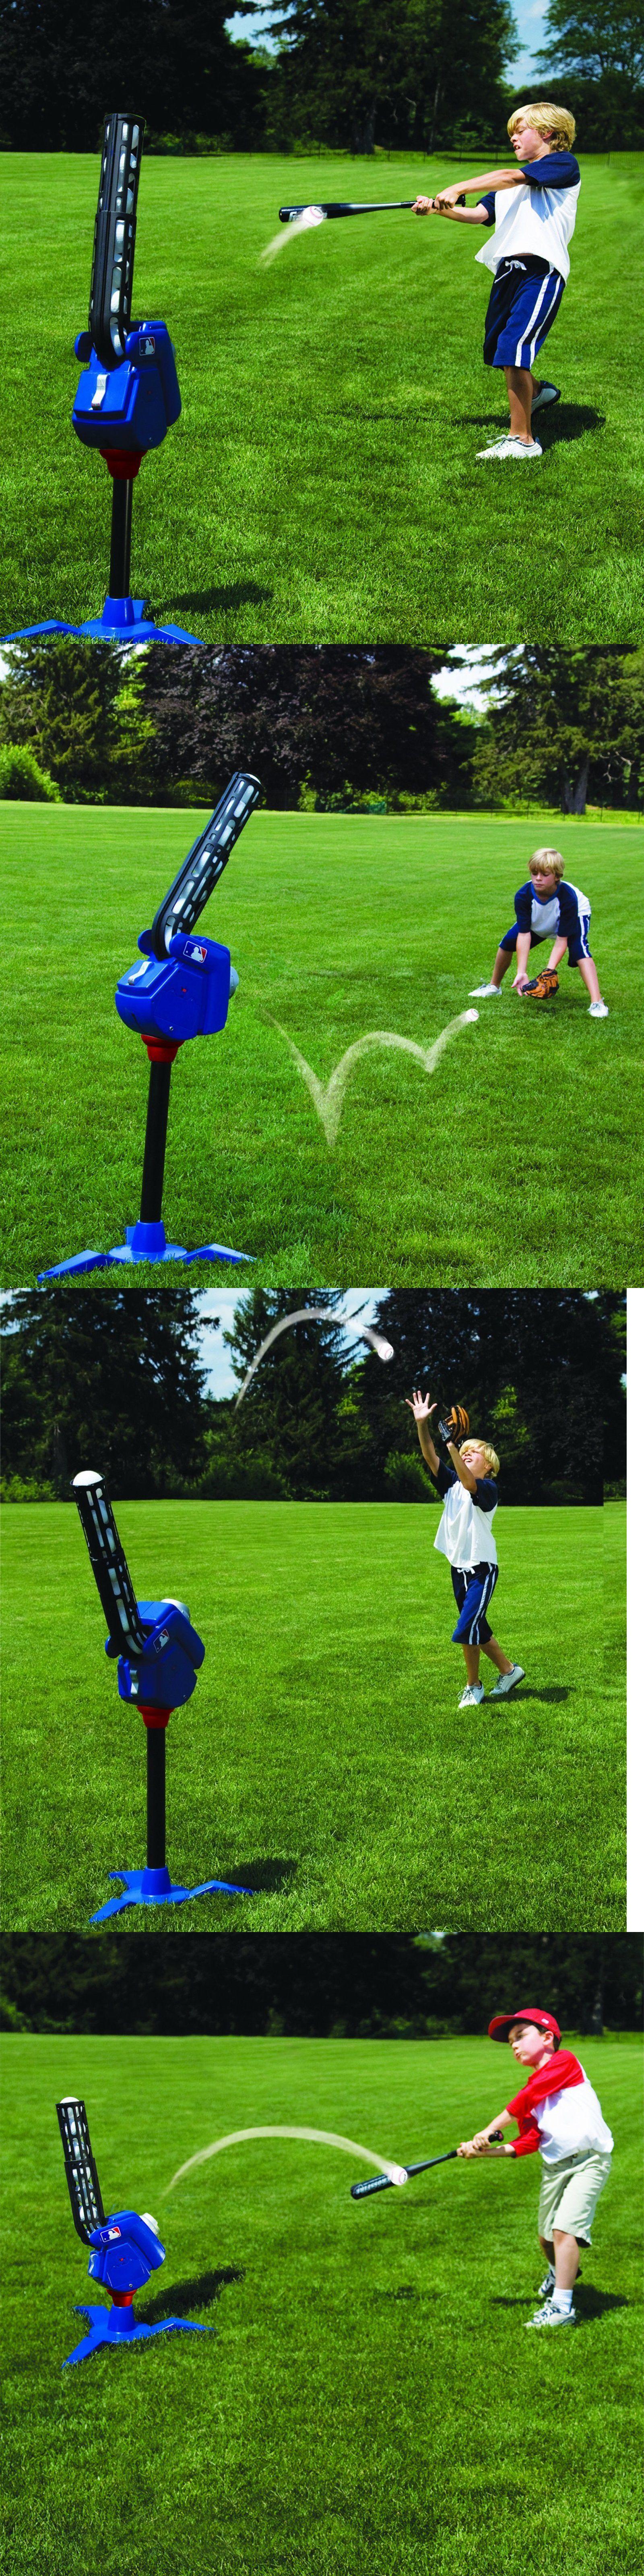 pitching machines 58061 4 in 1 pitching machine baseball training